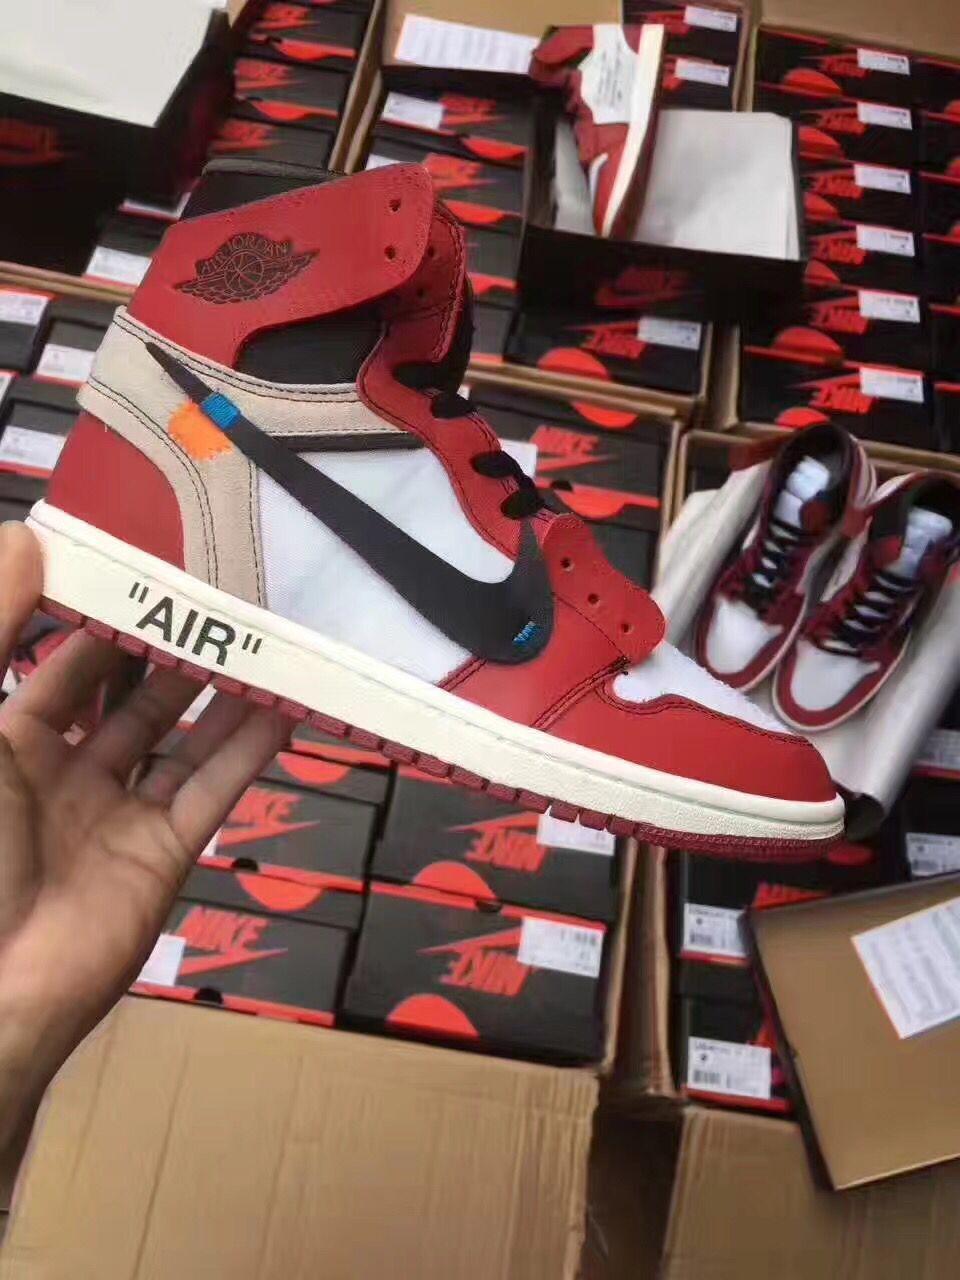 d0fb7fe6d87 Don't Get Got: Taobao Special Fake Off White Air Jordan 1 Are ...